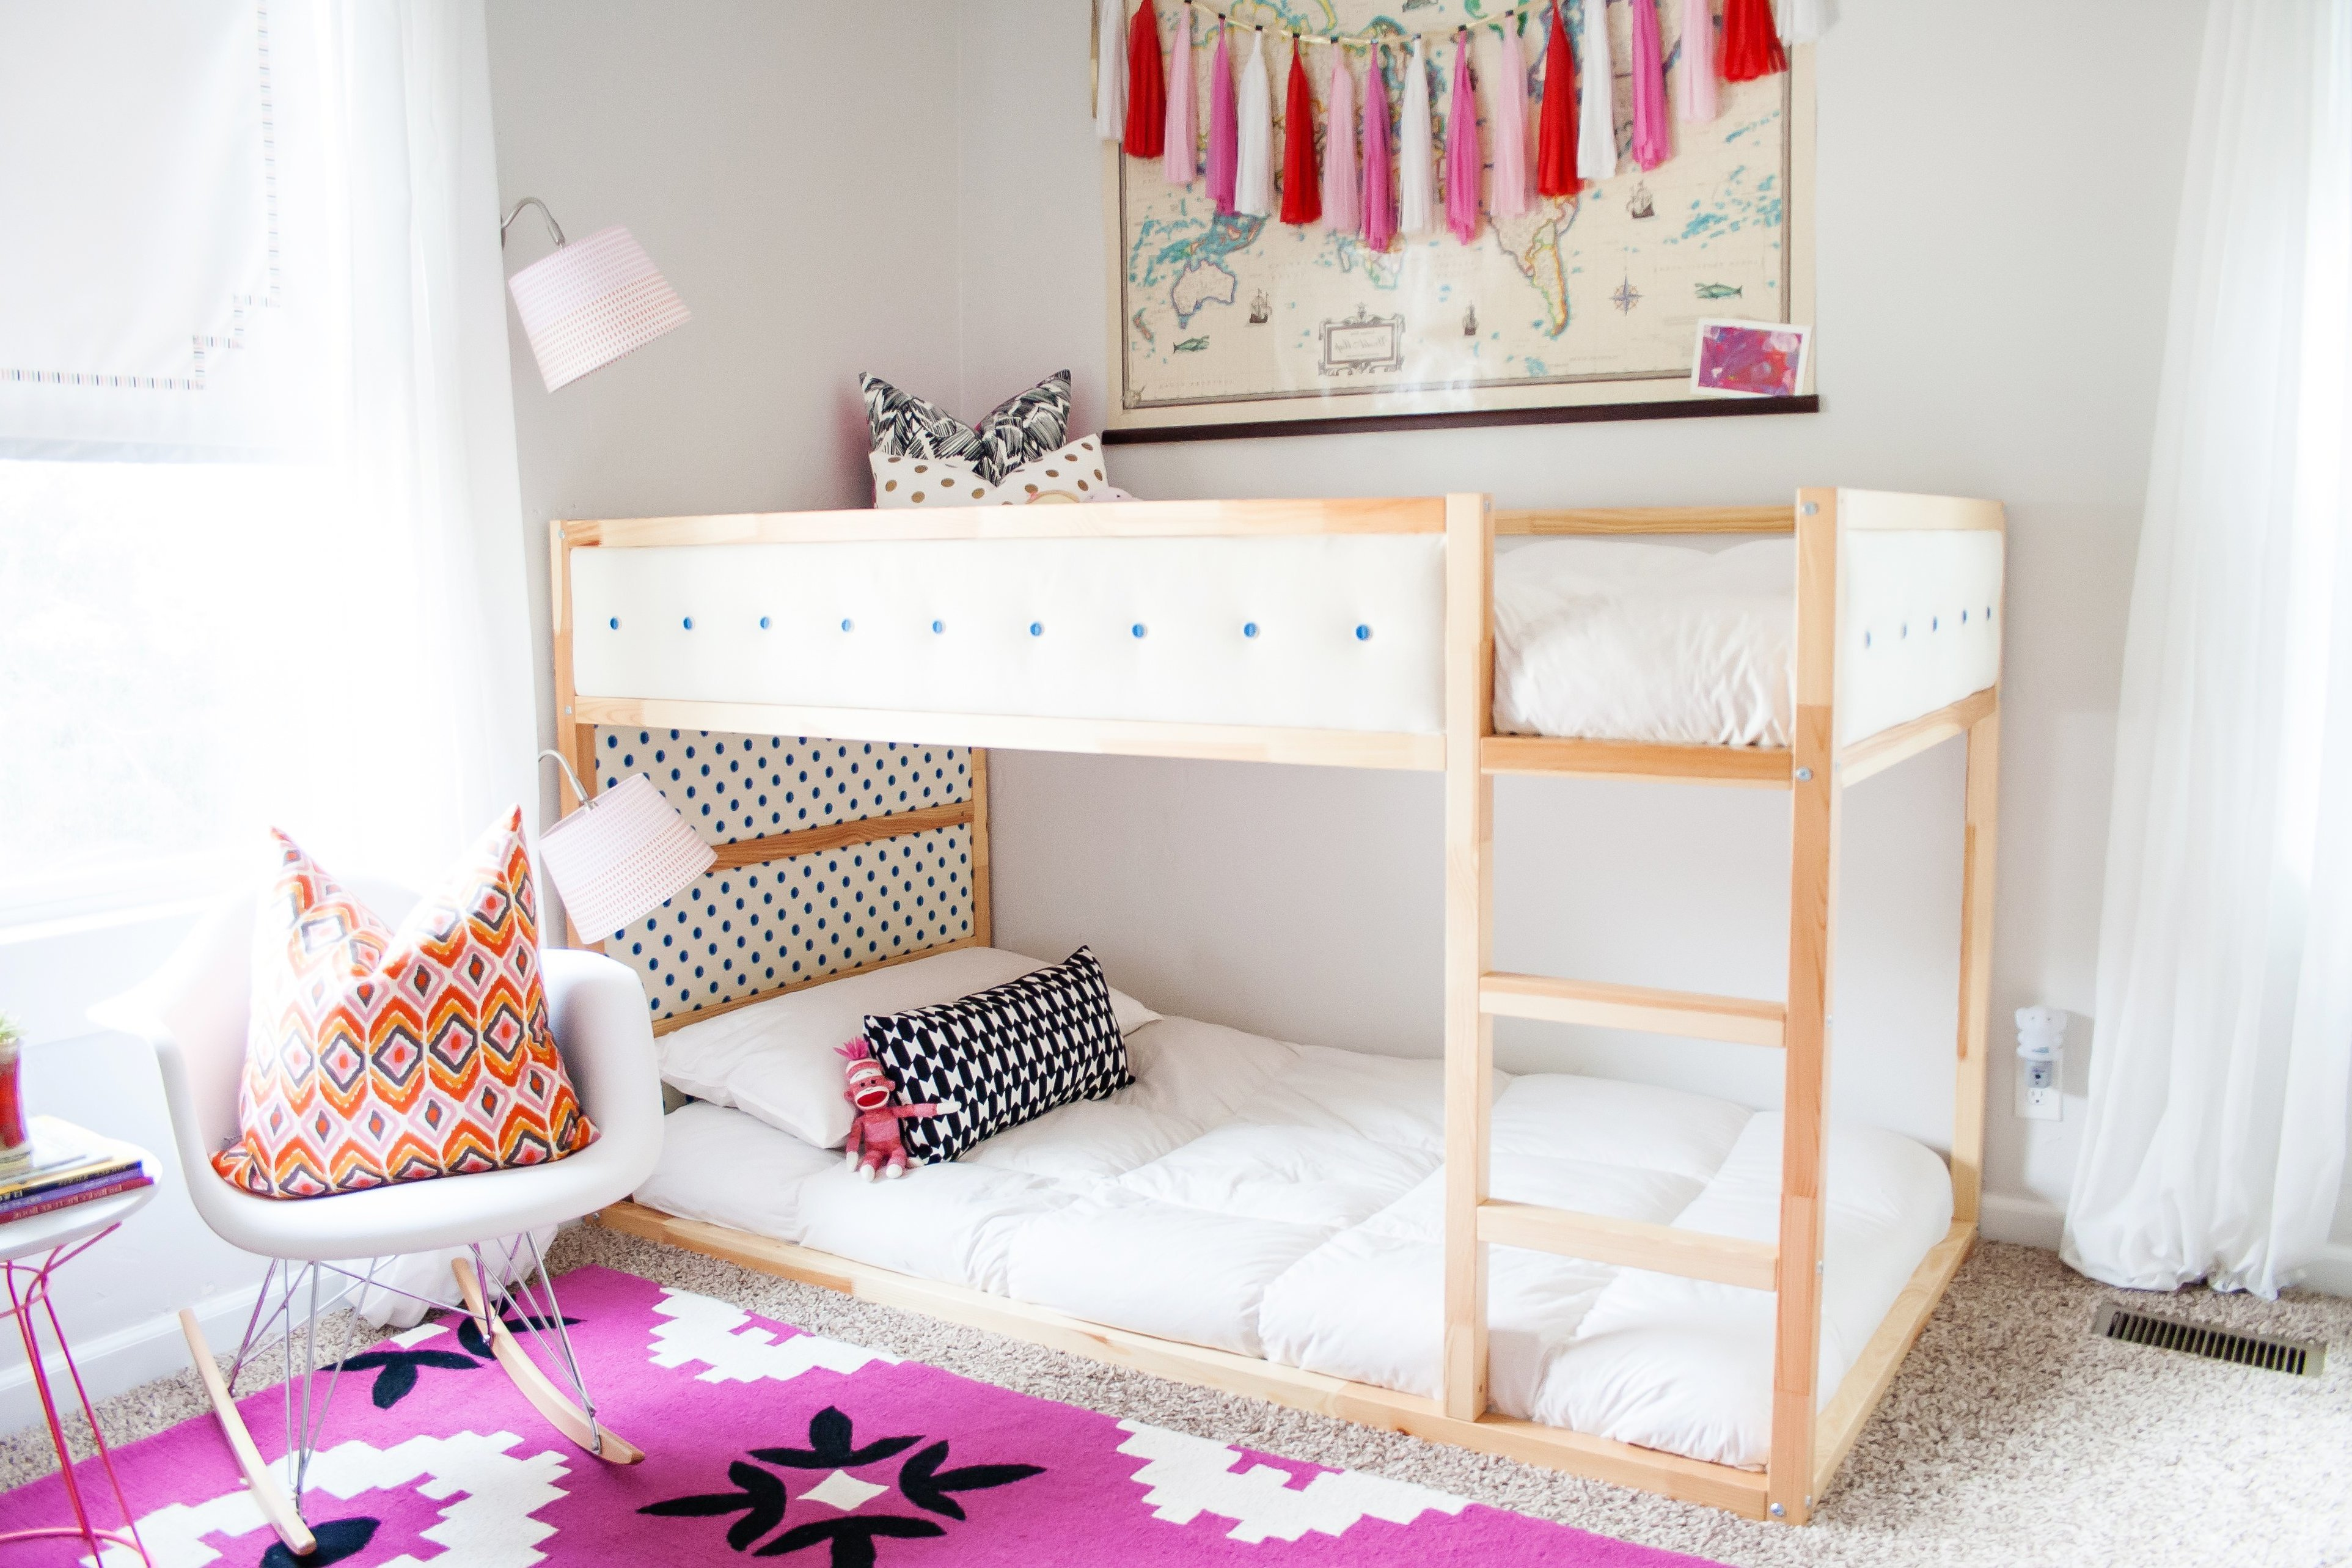 kinderzimmer pimpen 10 diy hacks f r ihr ikea kura bett kinderzimmer zenideen. Black Bedroom Furniture Sets. Home Design Ideas